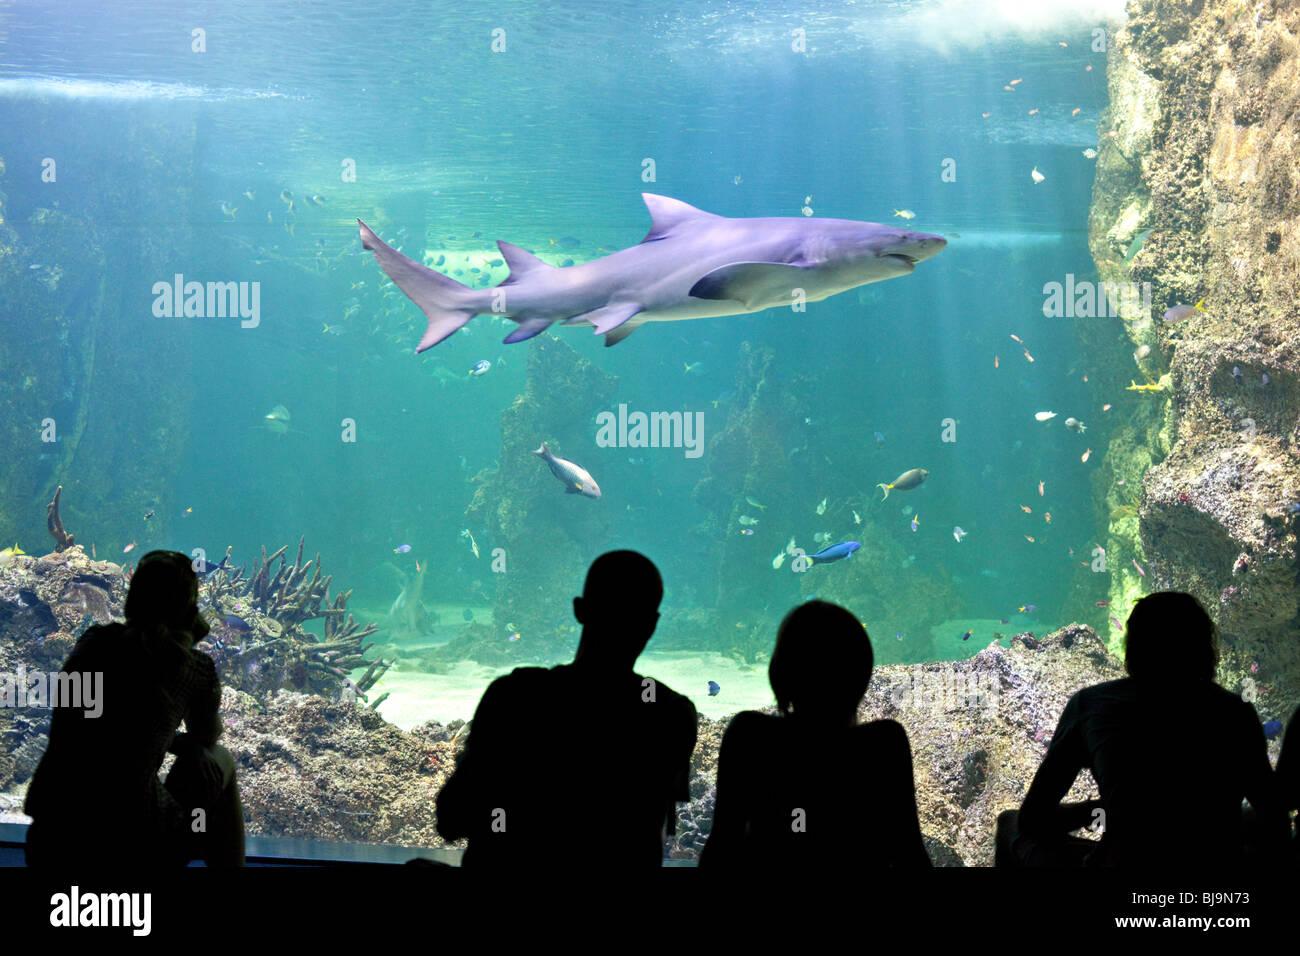 Tourists watching sharks in Sydney Aquarium, Australia - Stock Image